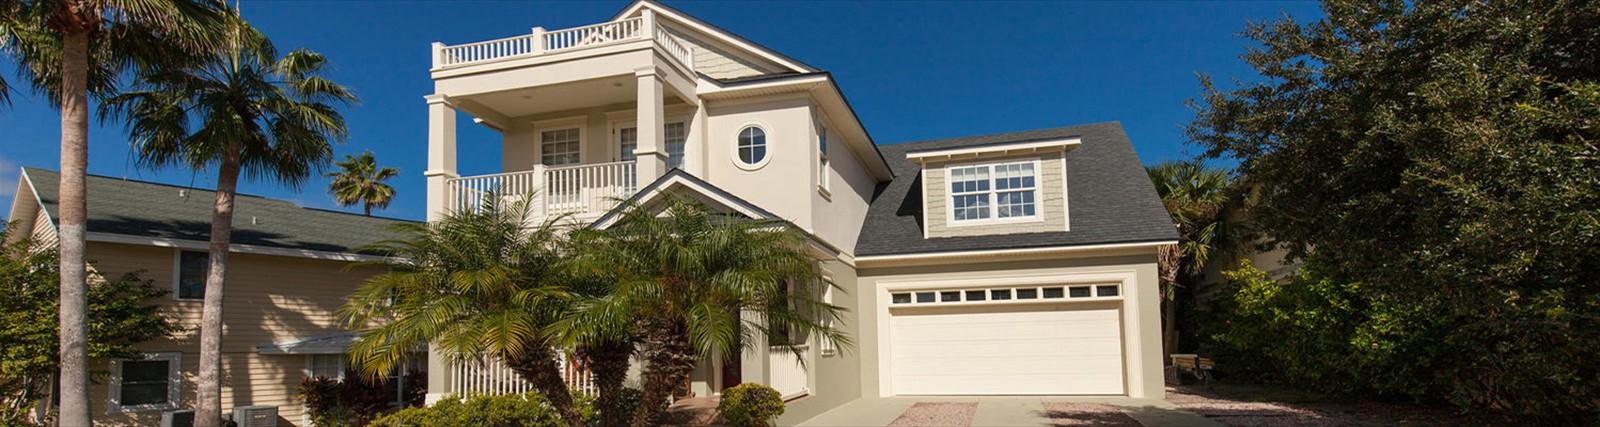 Stoughton Duran Custom Homes Palm Coast And Flagler